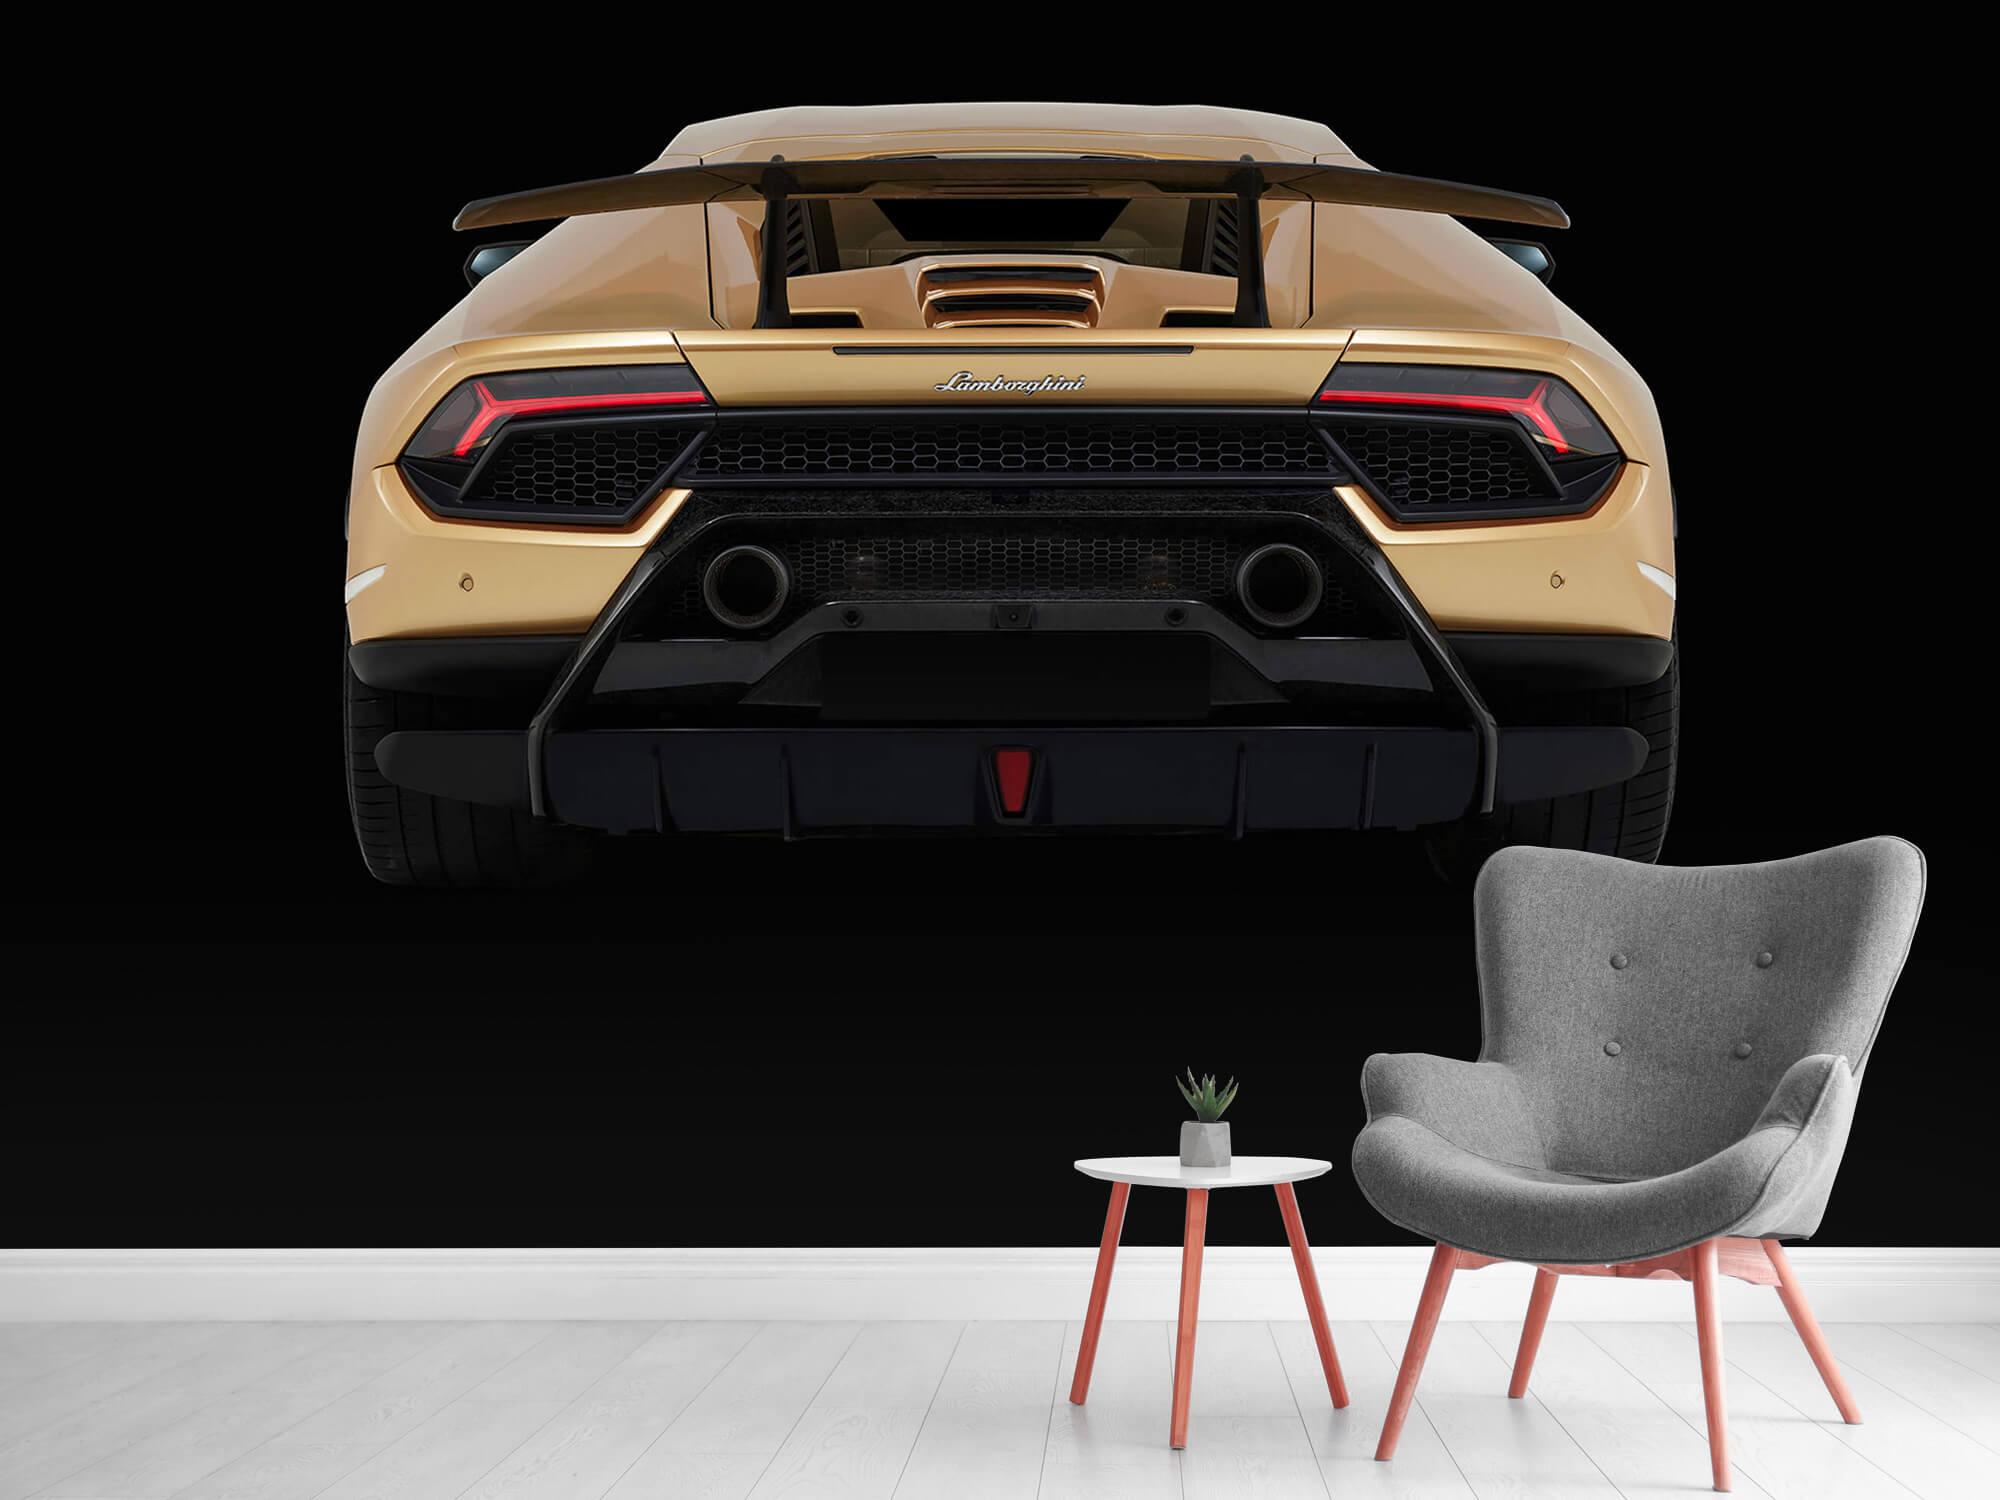 Wallpaper Lamborghini Huracán - Rear view, black 11